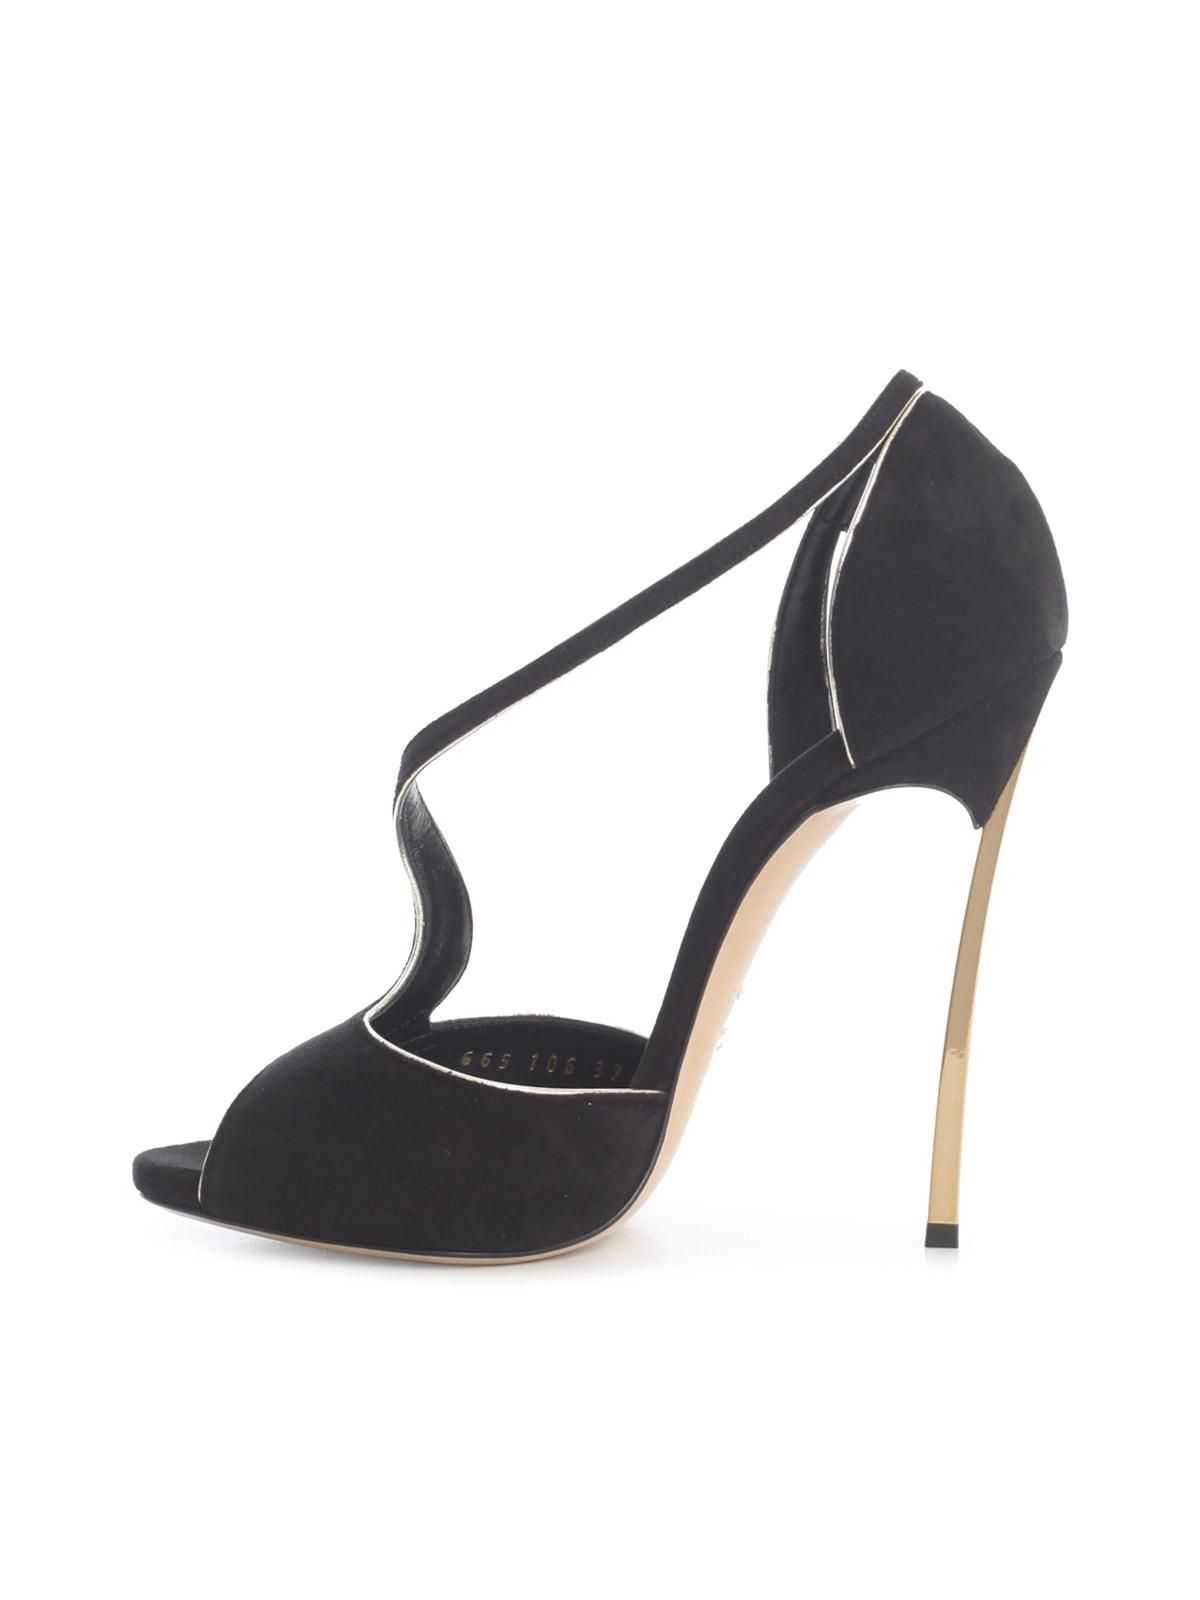 Cheap And Nice Casadei Suede High Sandals W/ Golden Heel - Great Deals